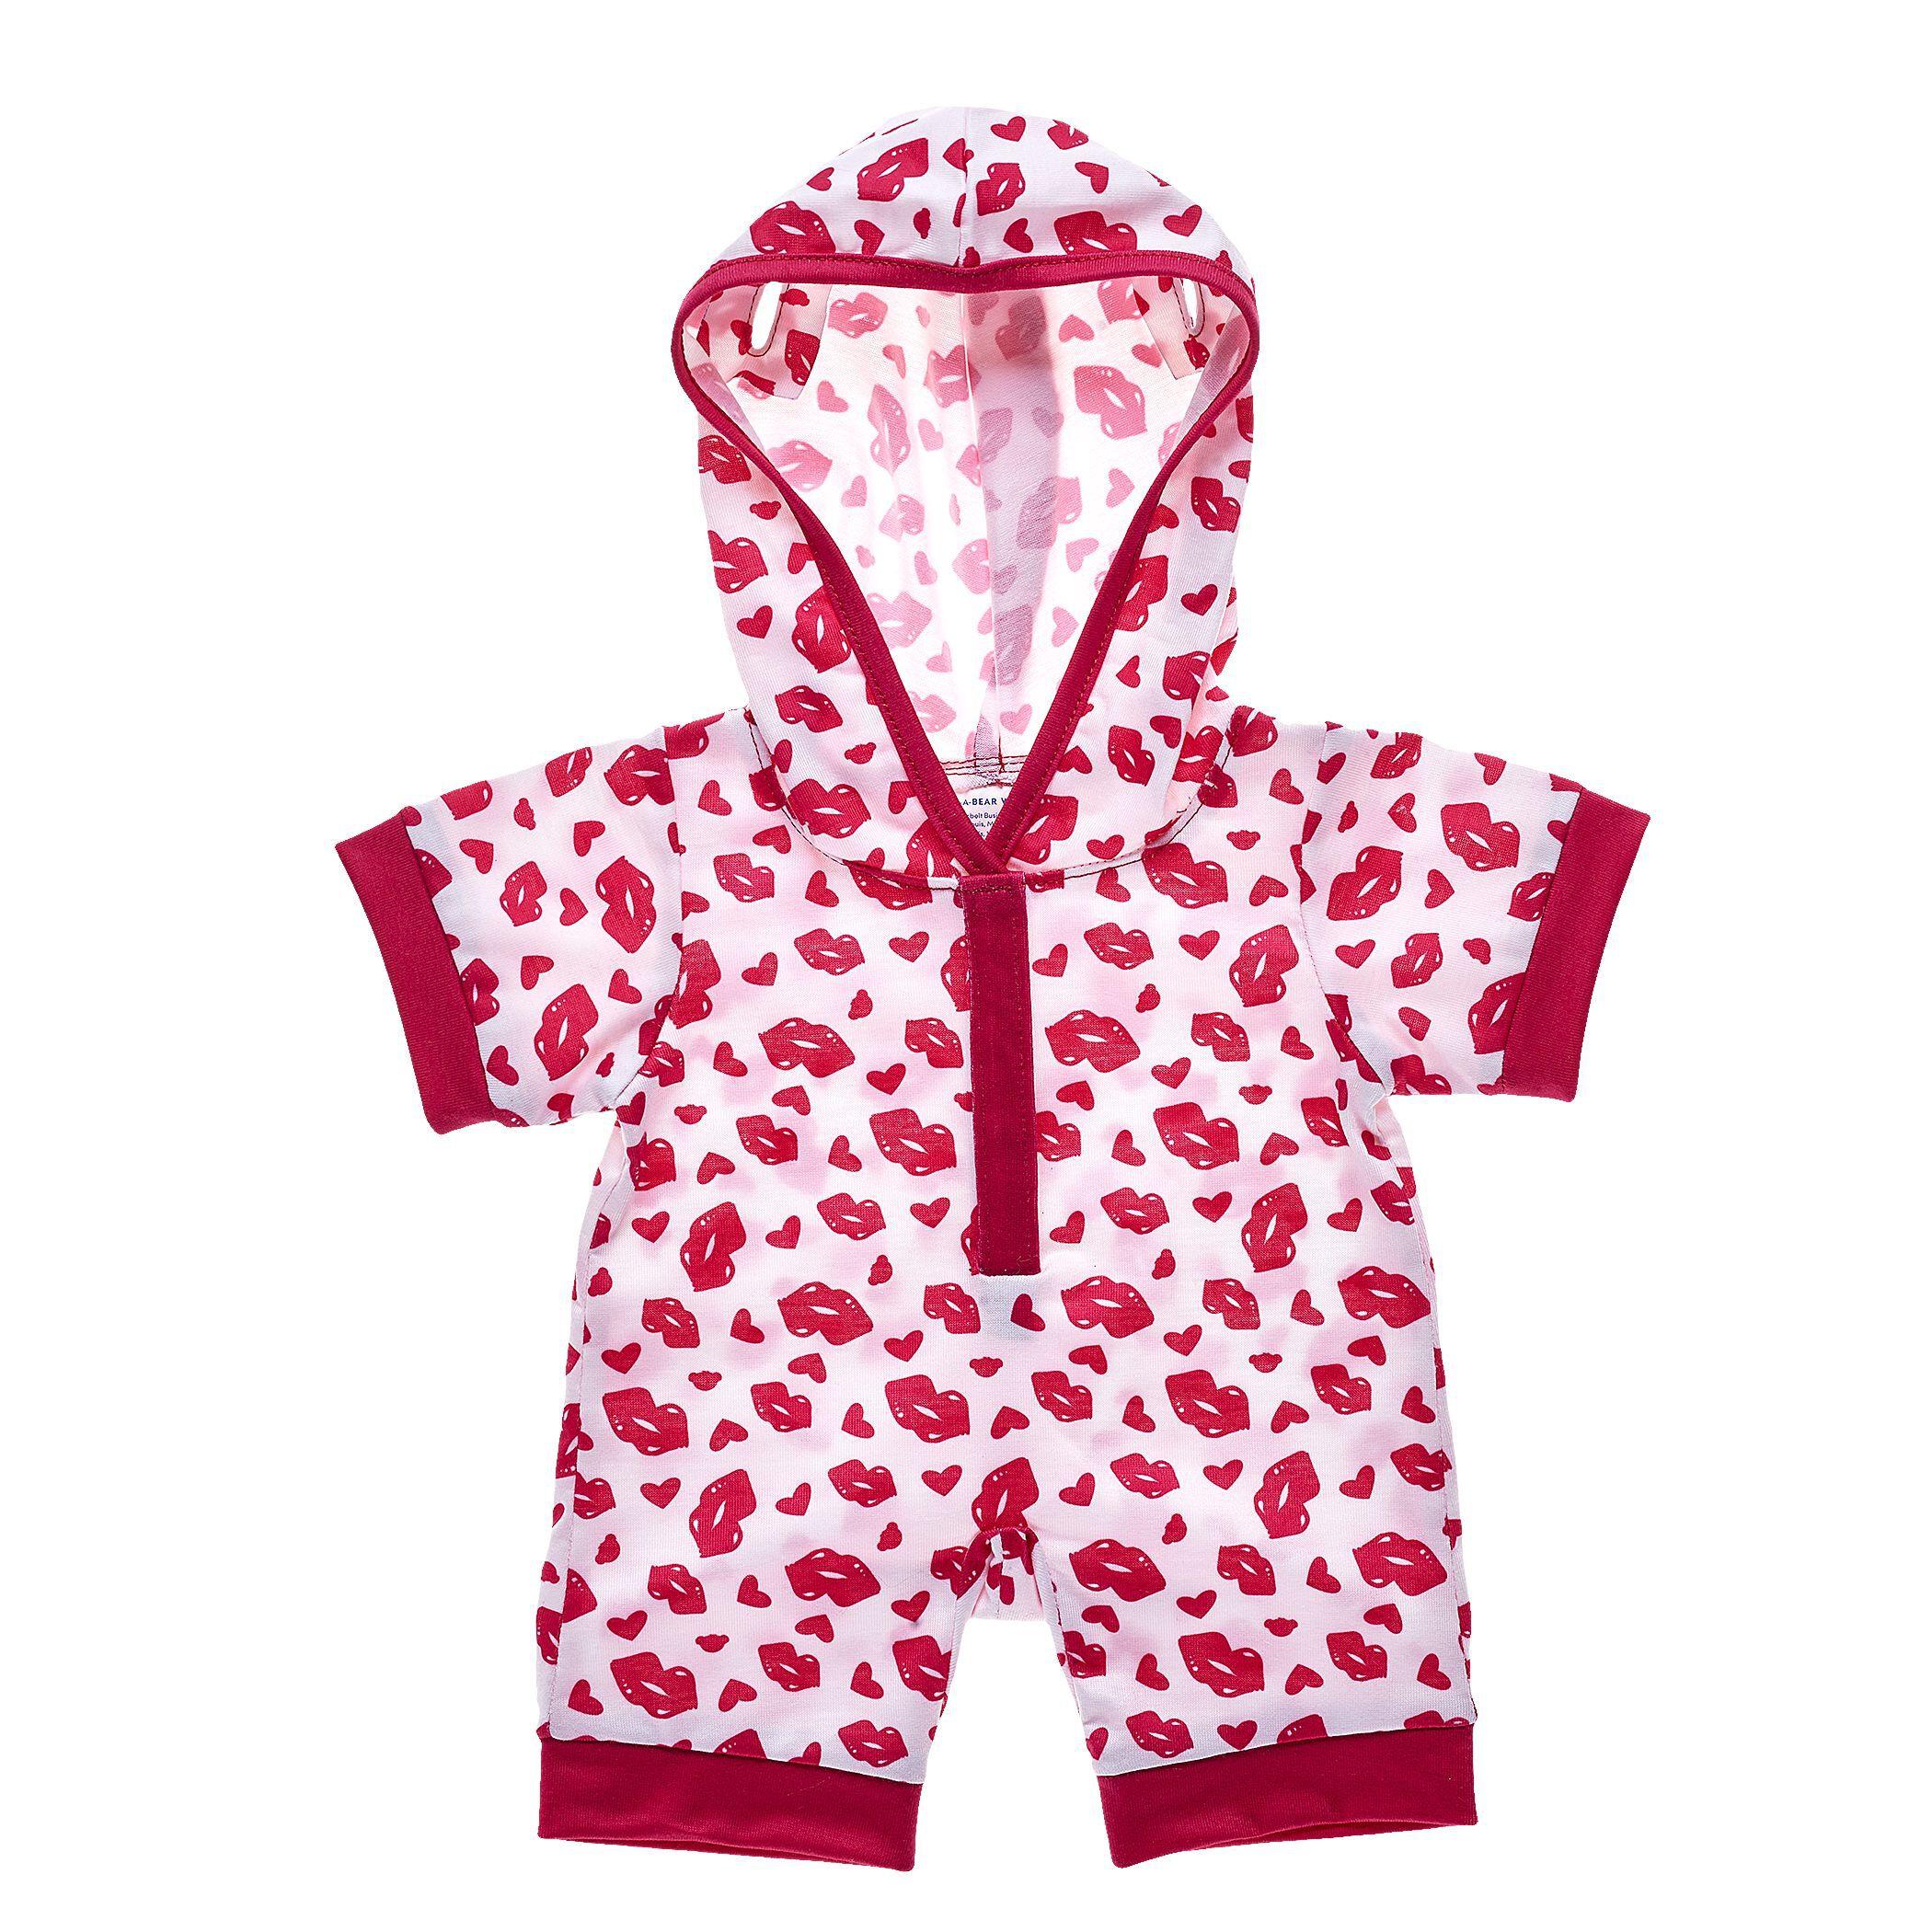 picture regarding Free Printable Build a Bear Clothes Patterns titled Sleepwear Garments Establish-A-Bear®